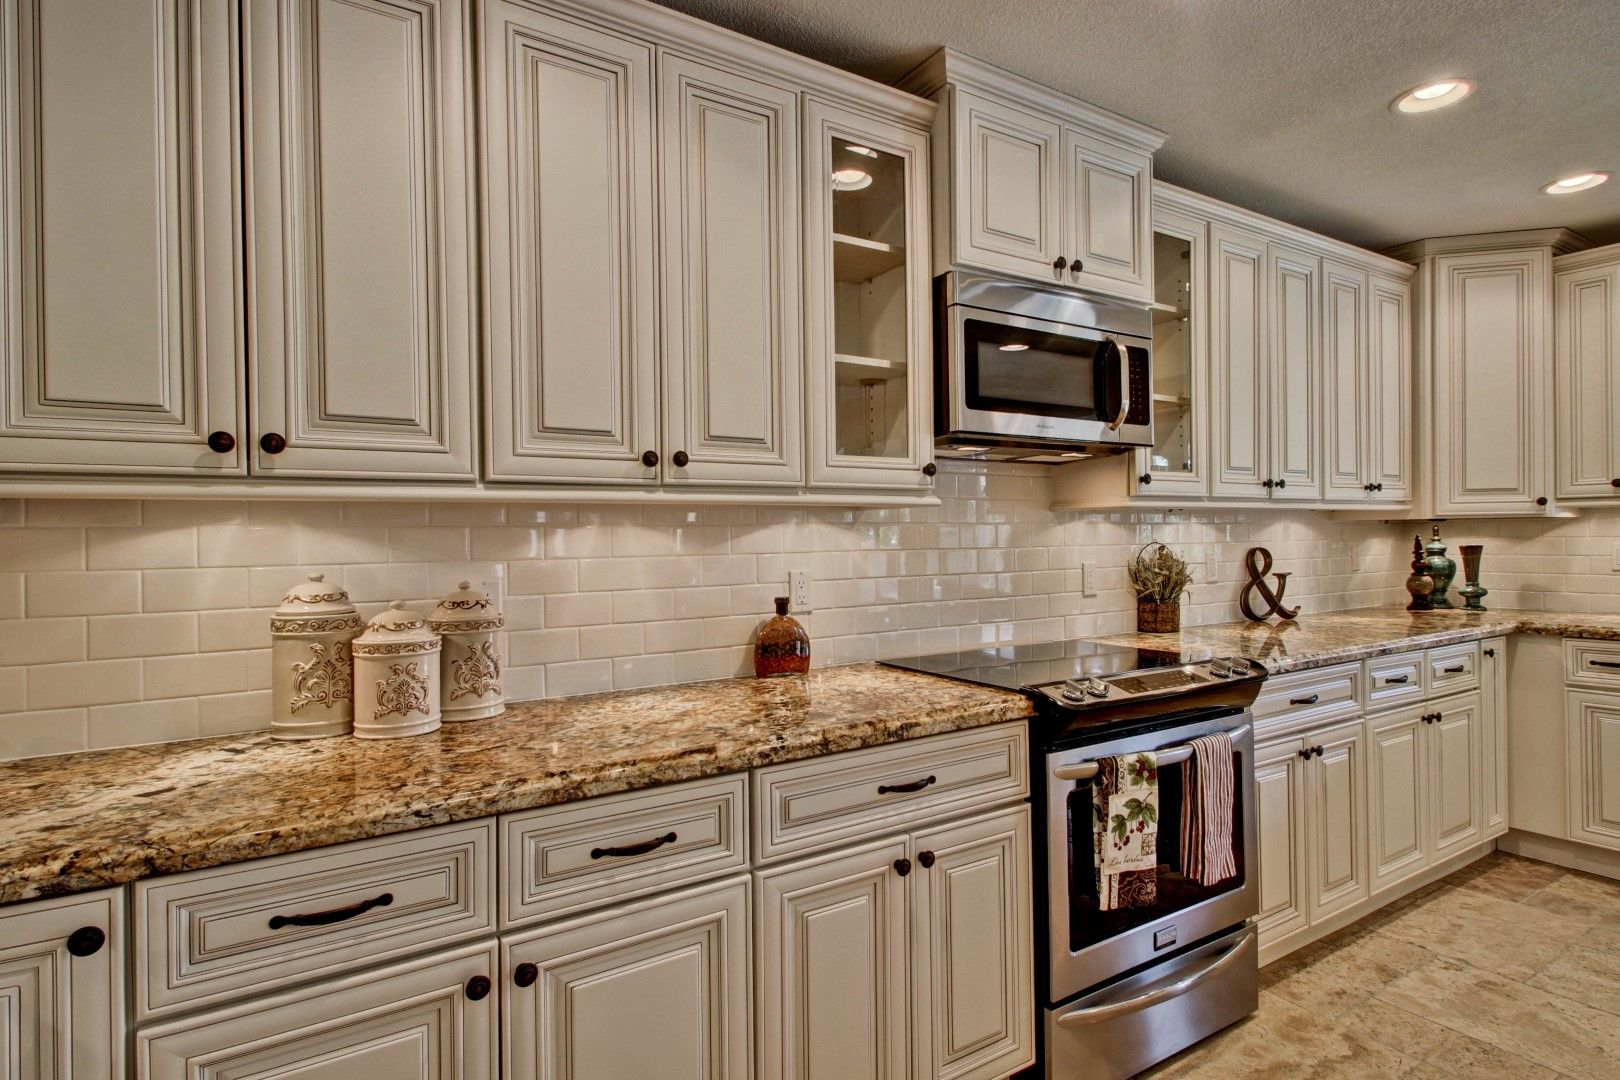 Huge Kitchen Is An Entertaining Chefs Dream Expansive Mascarello Granite Island Gorgeous C Best Kitchen Cabinets Kitchen Cabinets Decor Antique White Kitchen